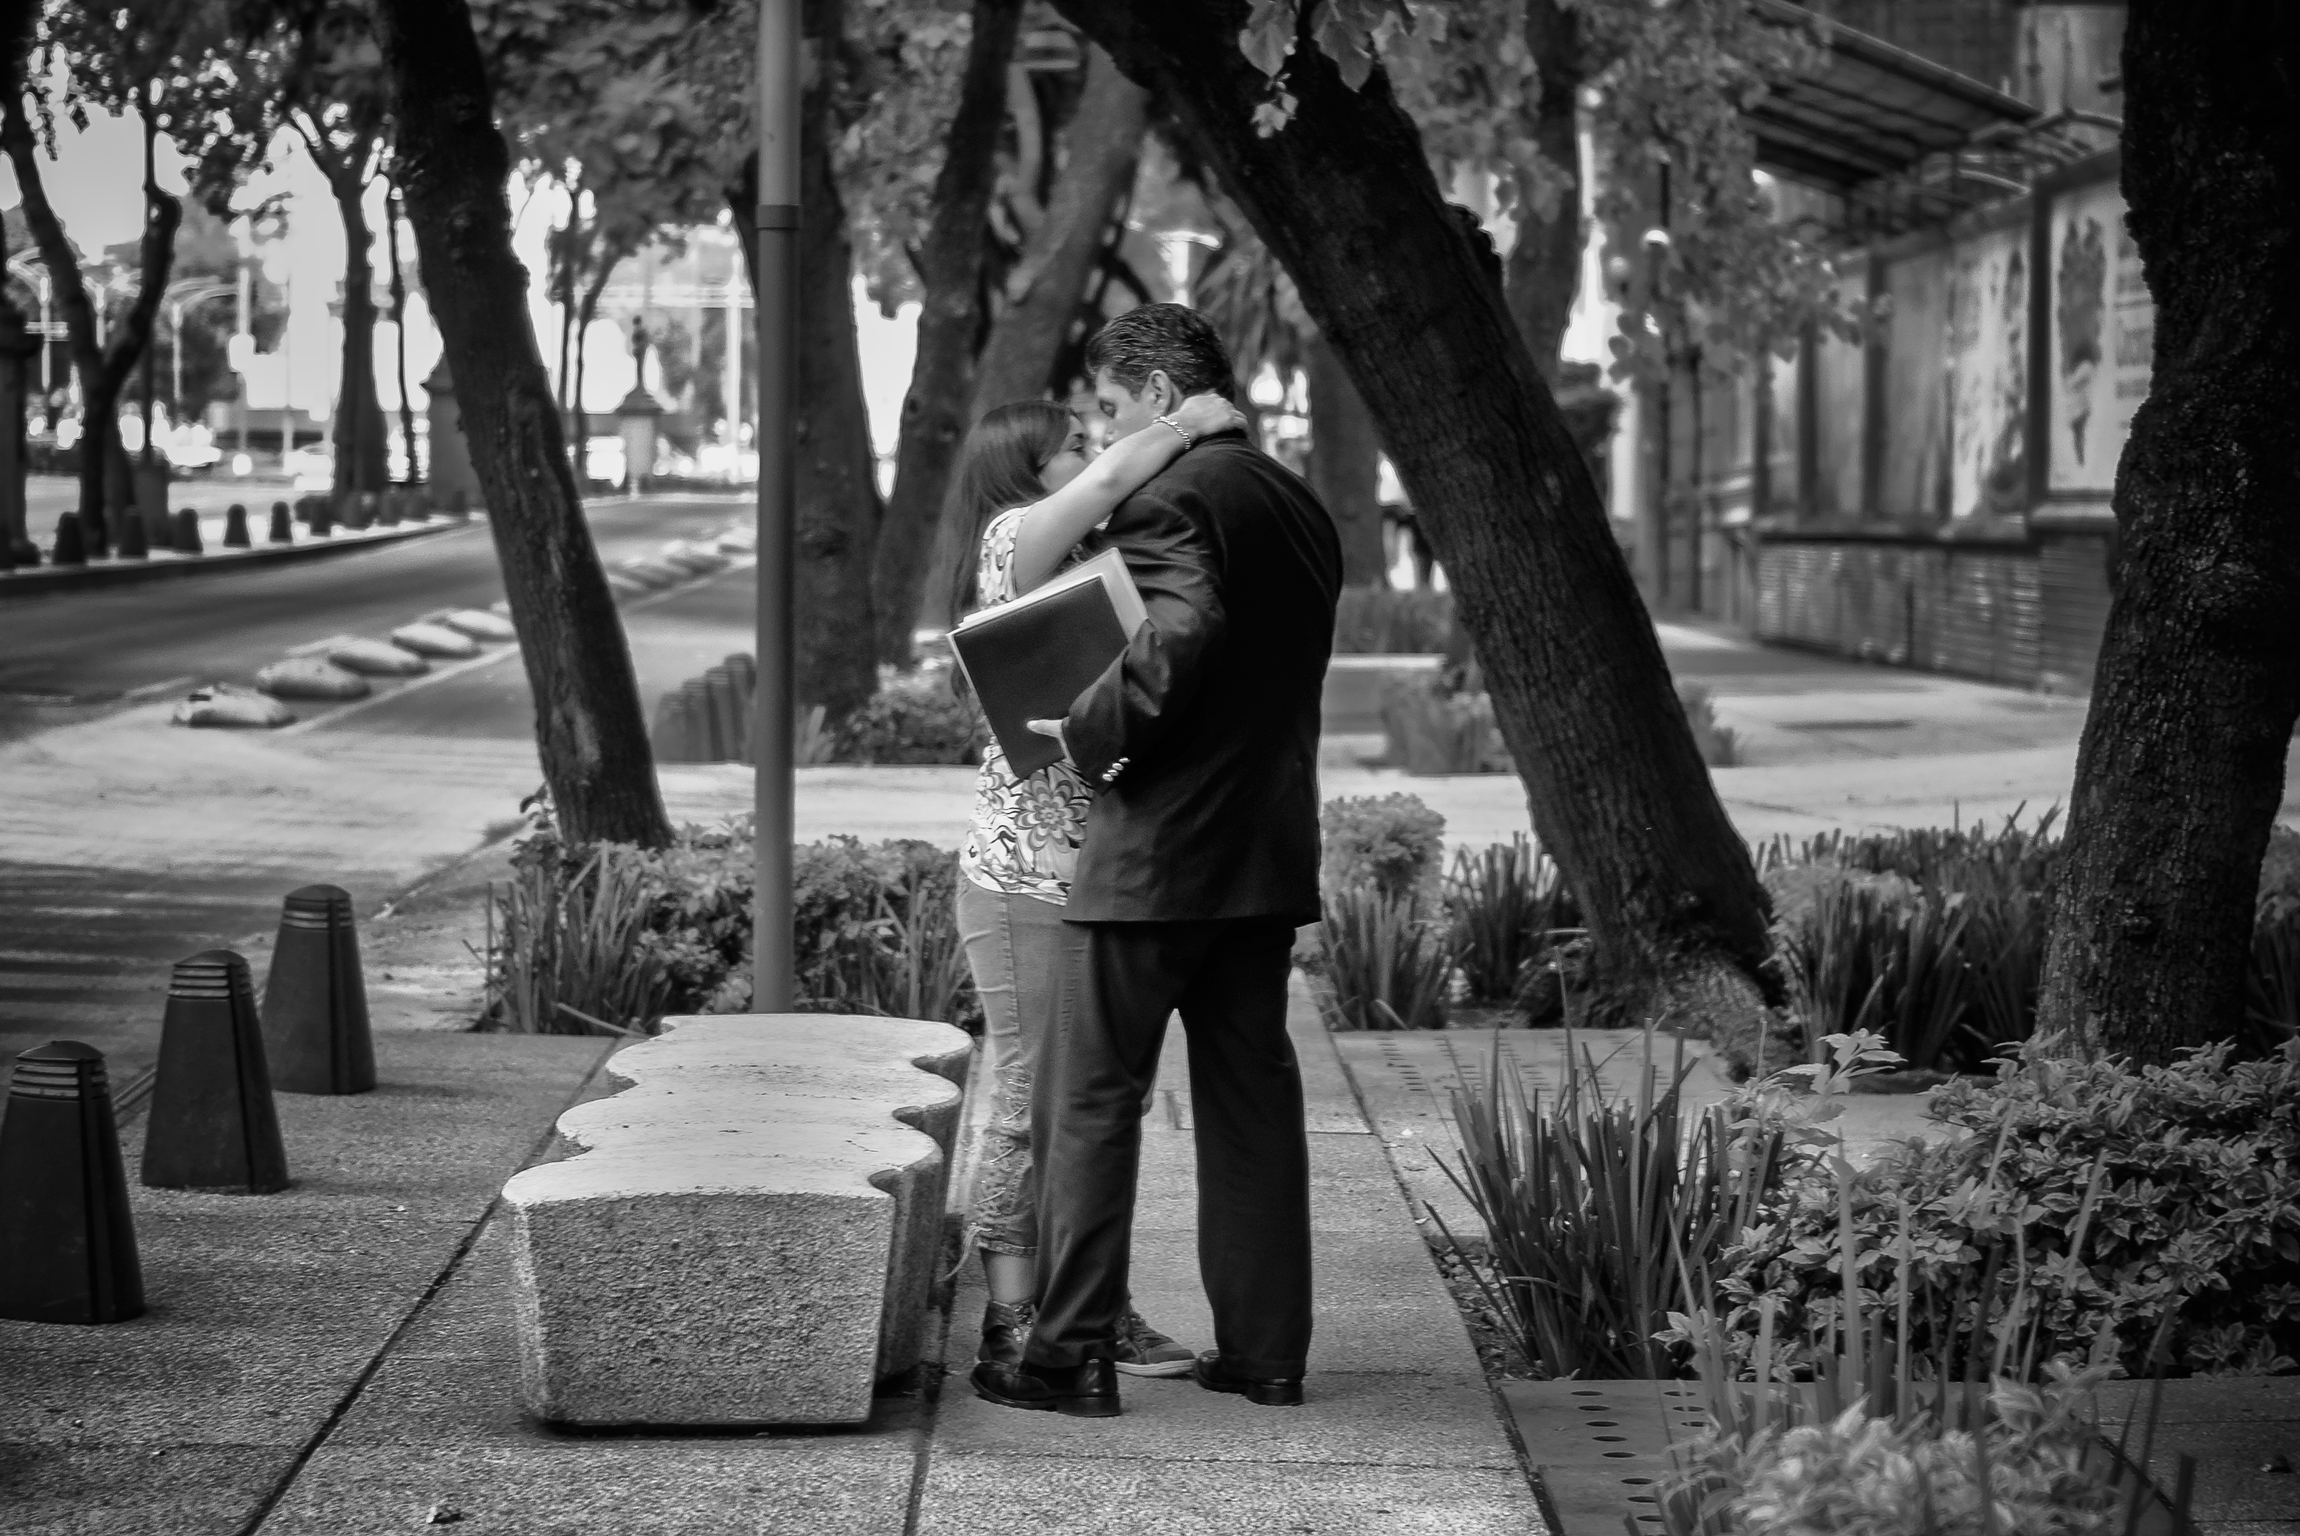 Kissing on Av. Reforma